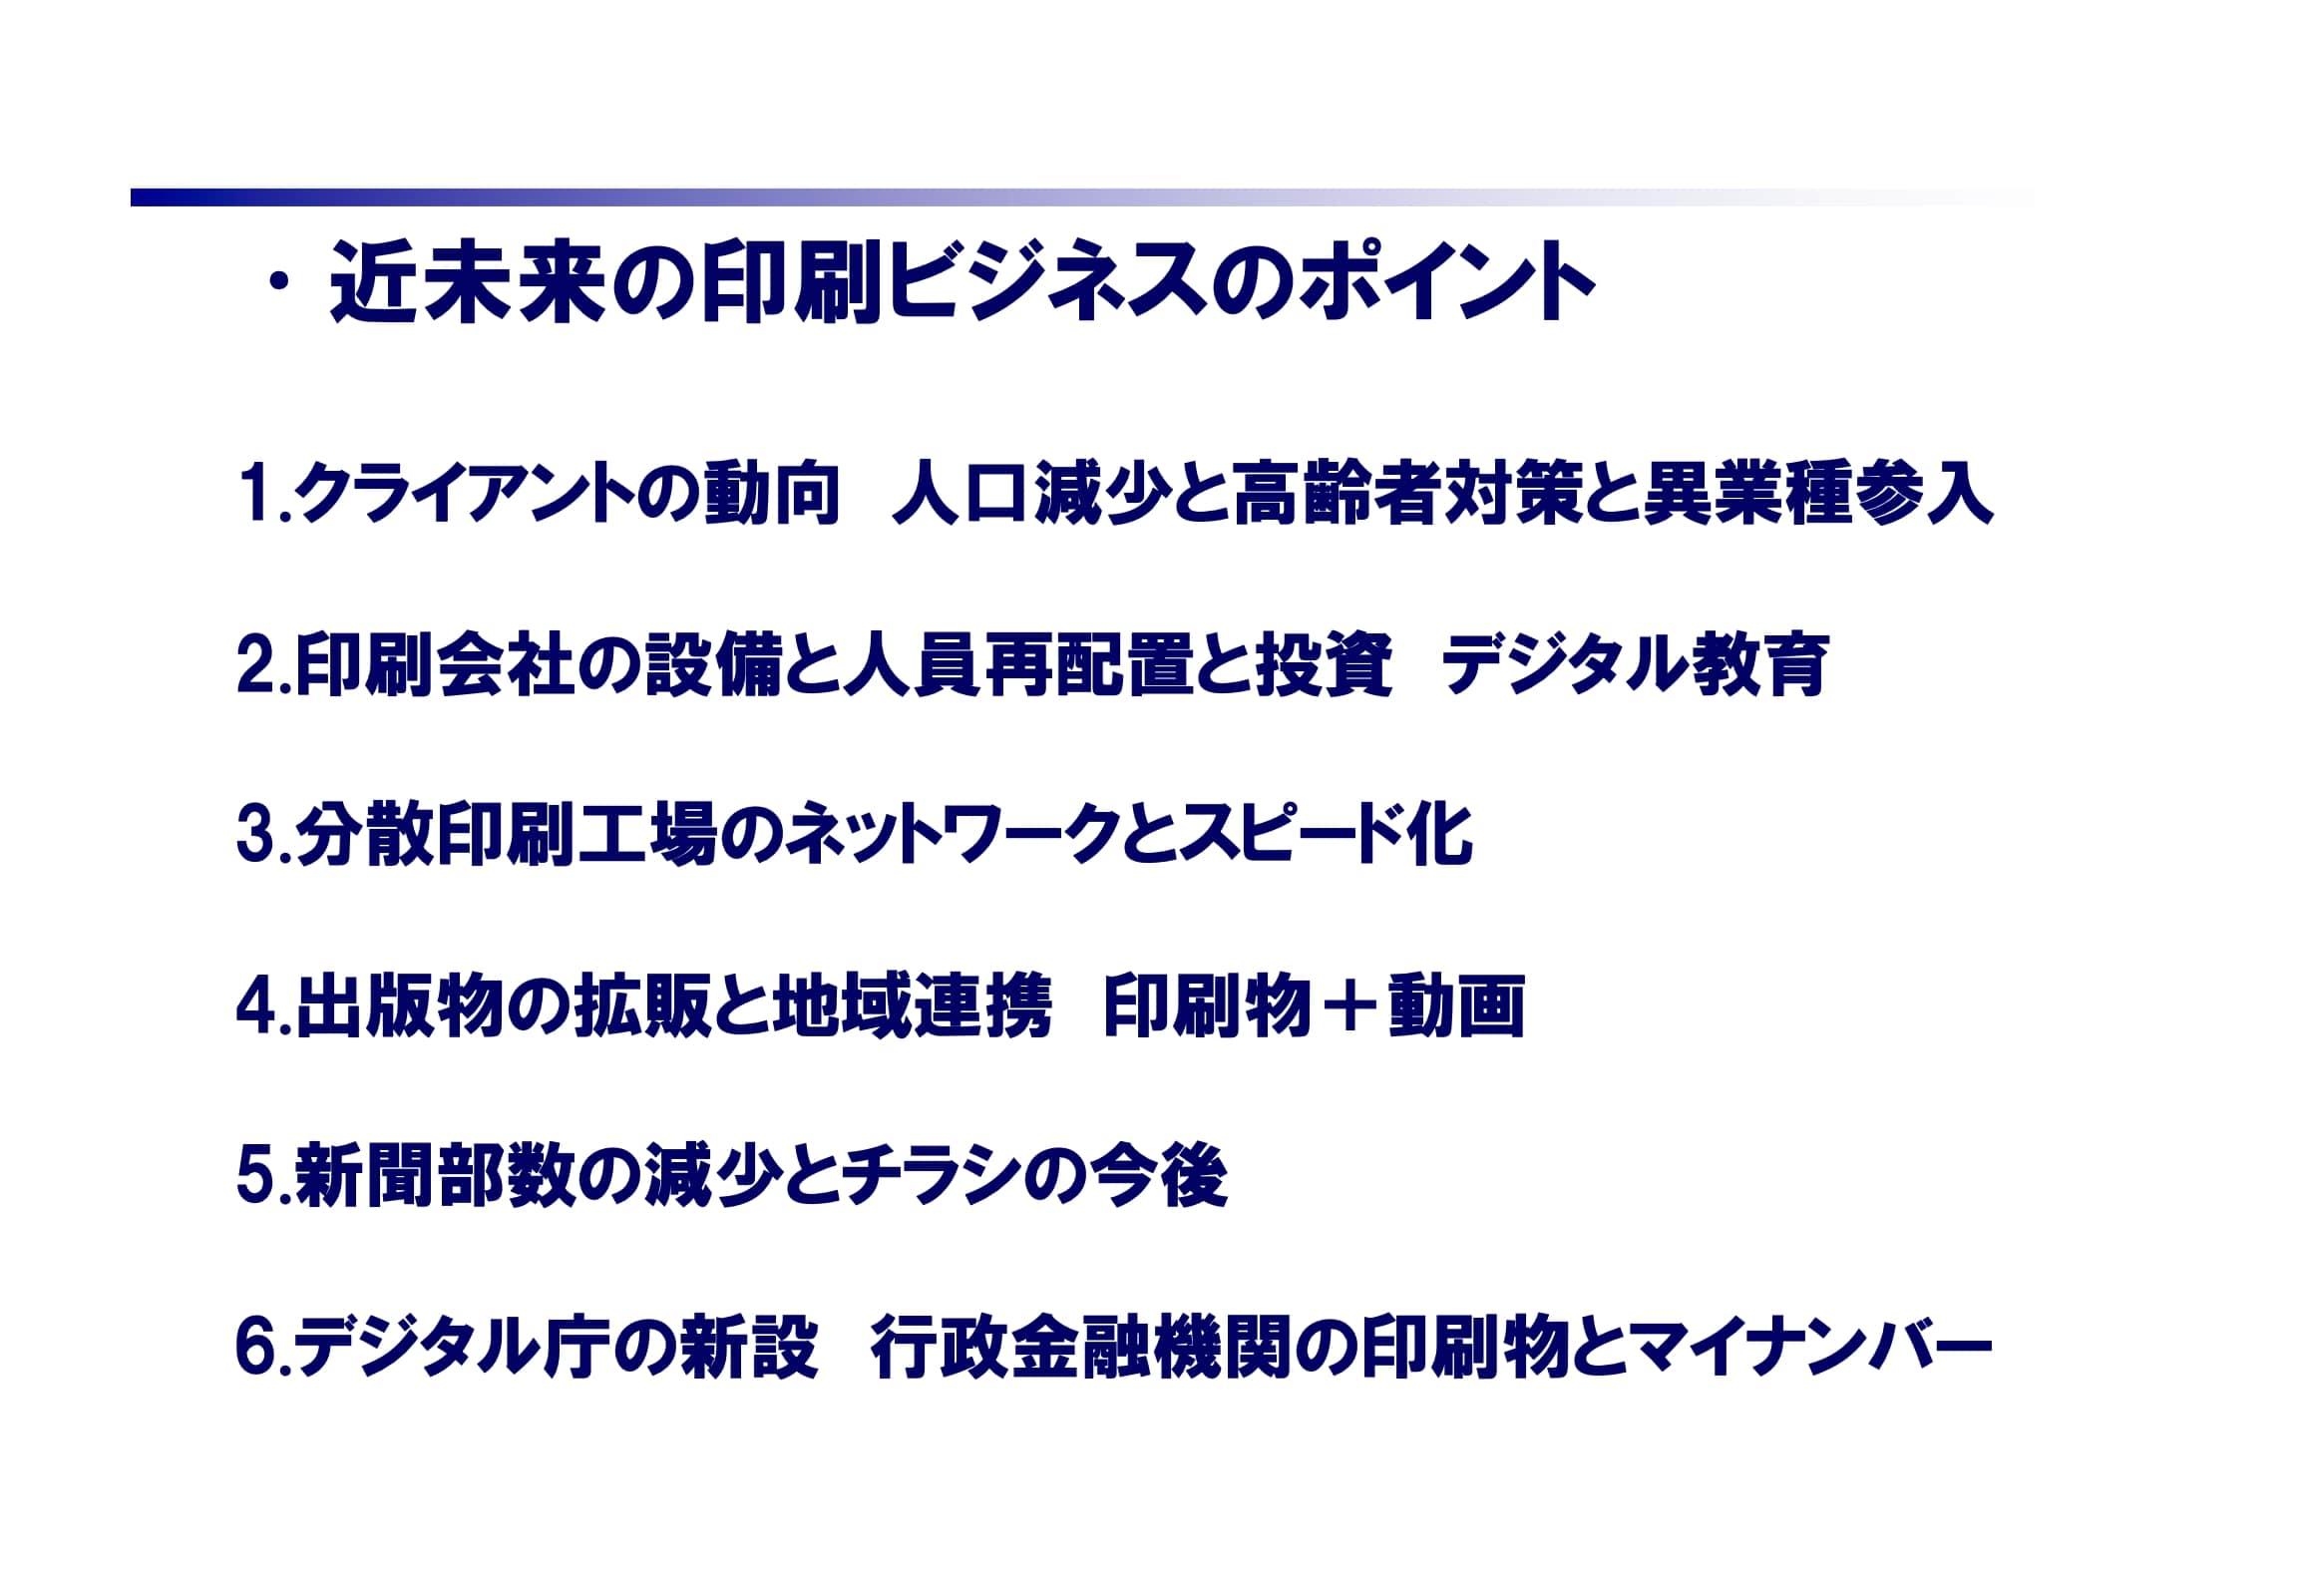 /speakerOnline/Online_conf_details/C9/C9_01.jpg